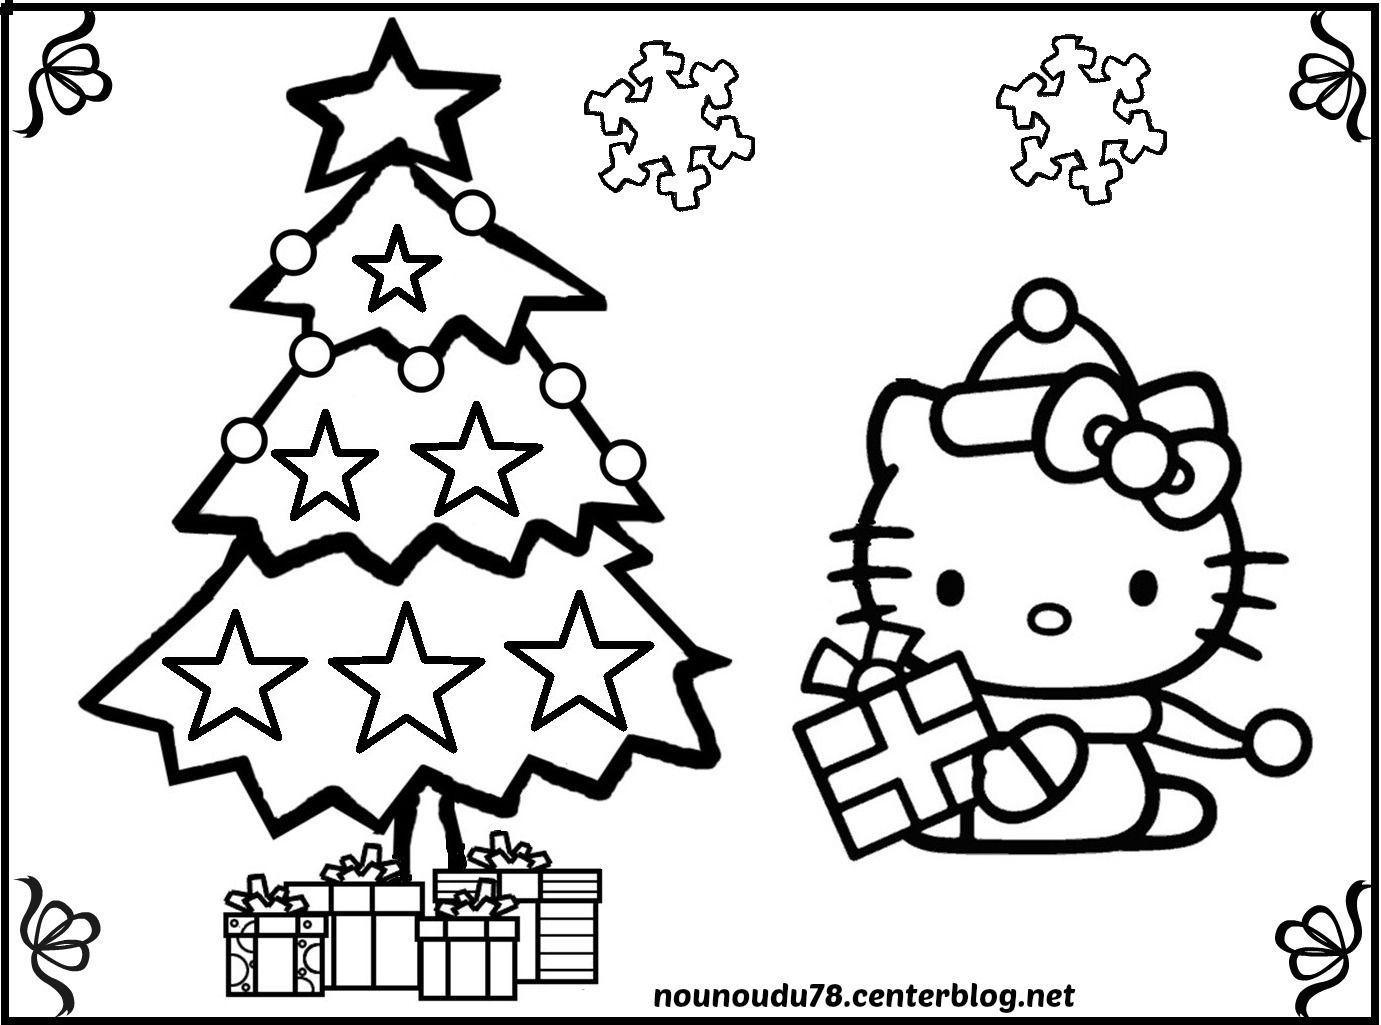 Dessin Traineau Avec Sapin De Noel | Search Results destiné Dessin Hello Kitty À Imprimer